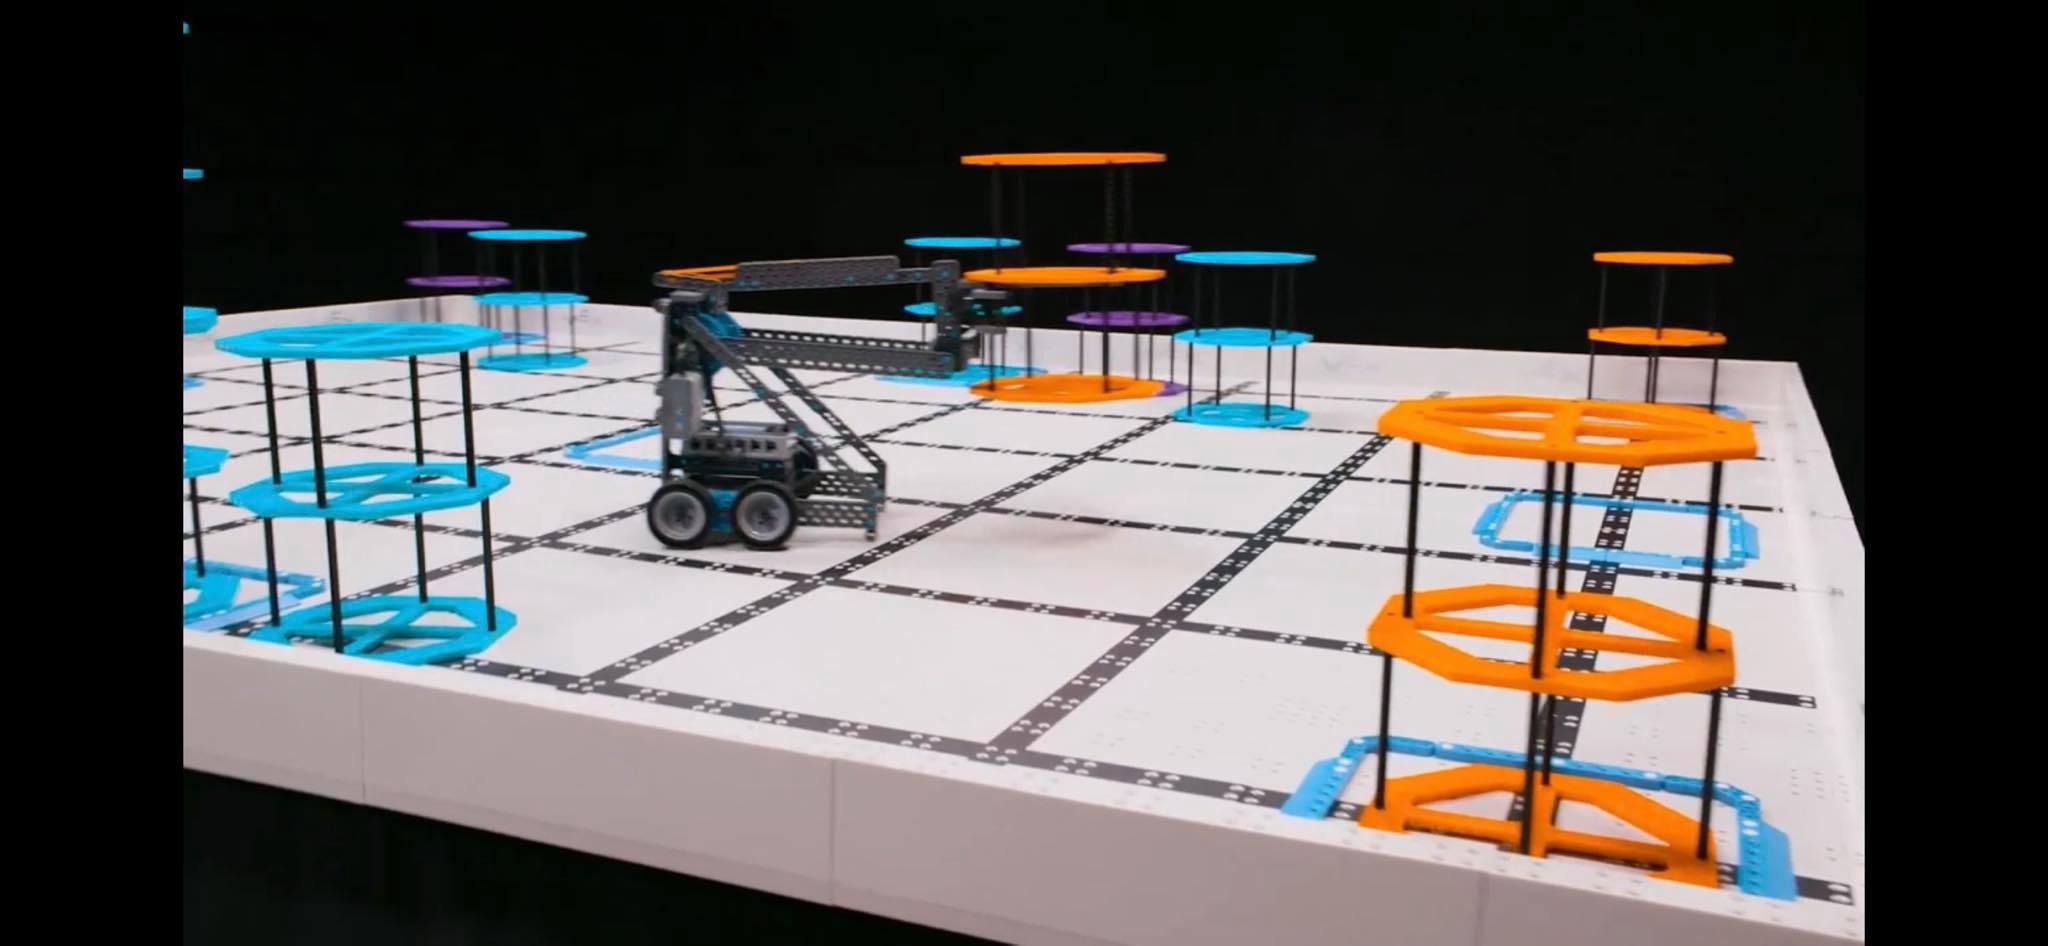 Robotics - VEX IQ